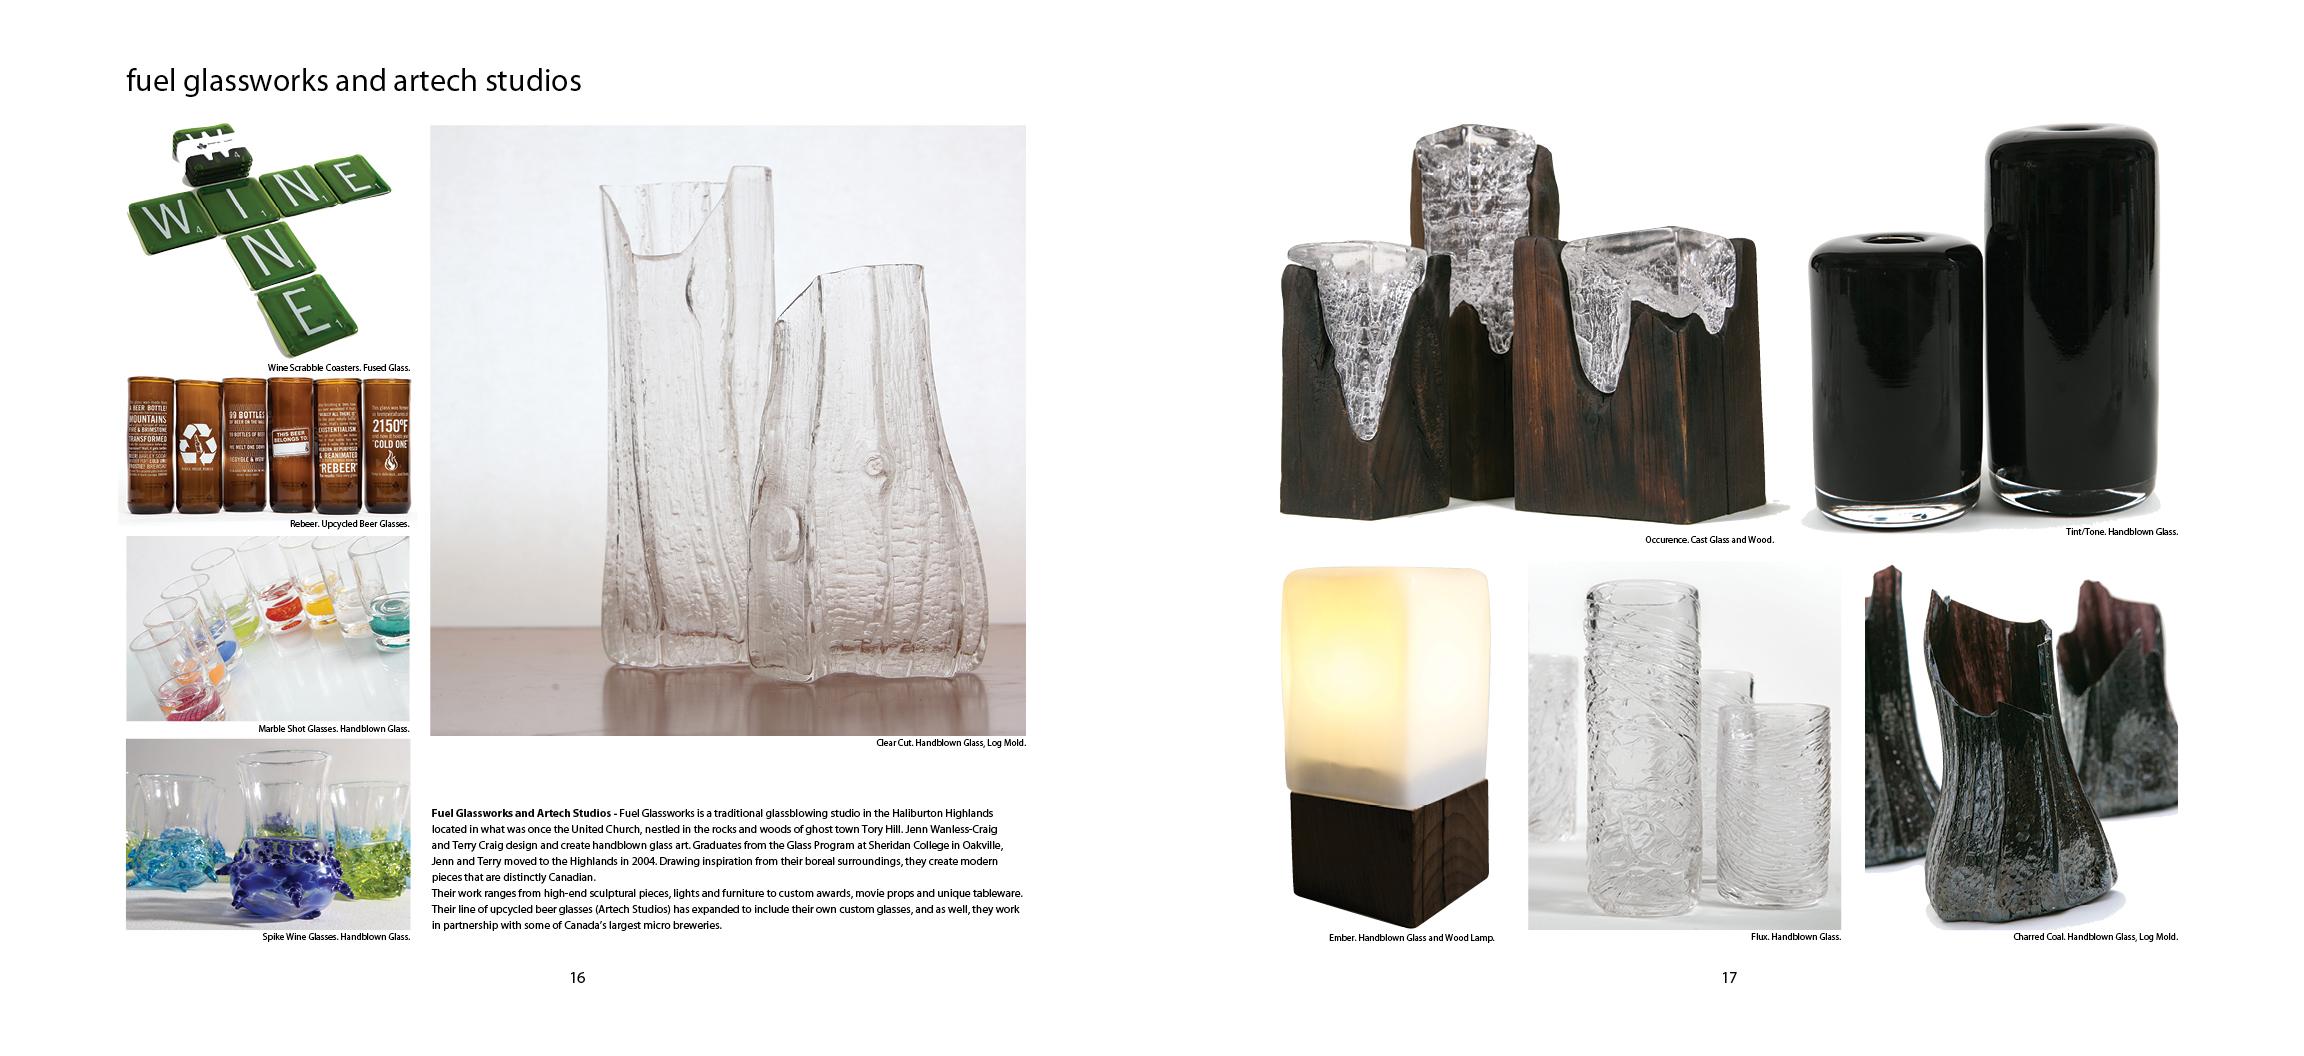 Fuel Glassworks and Artech Studio - Artists